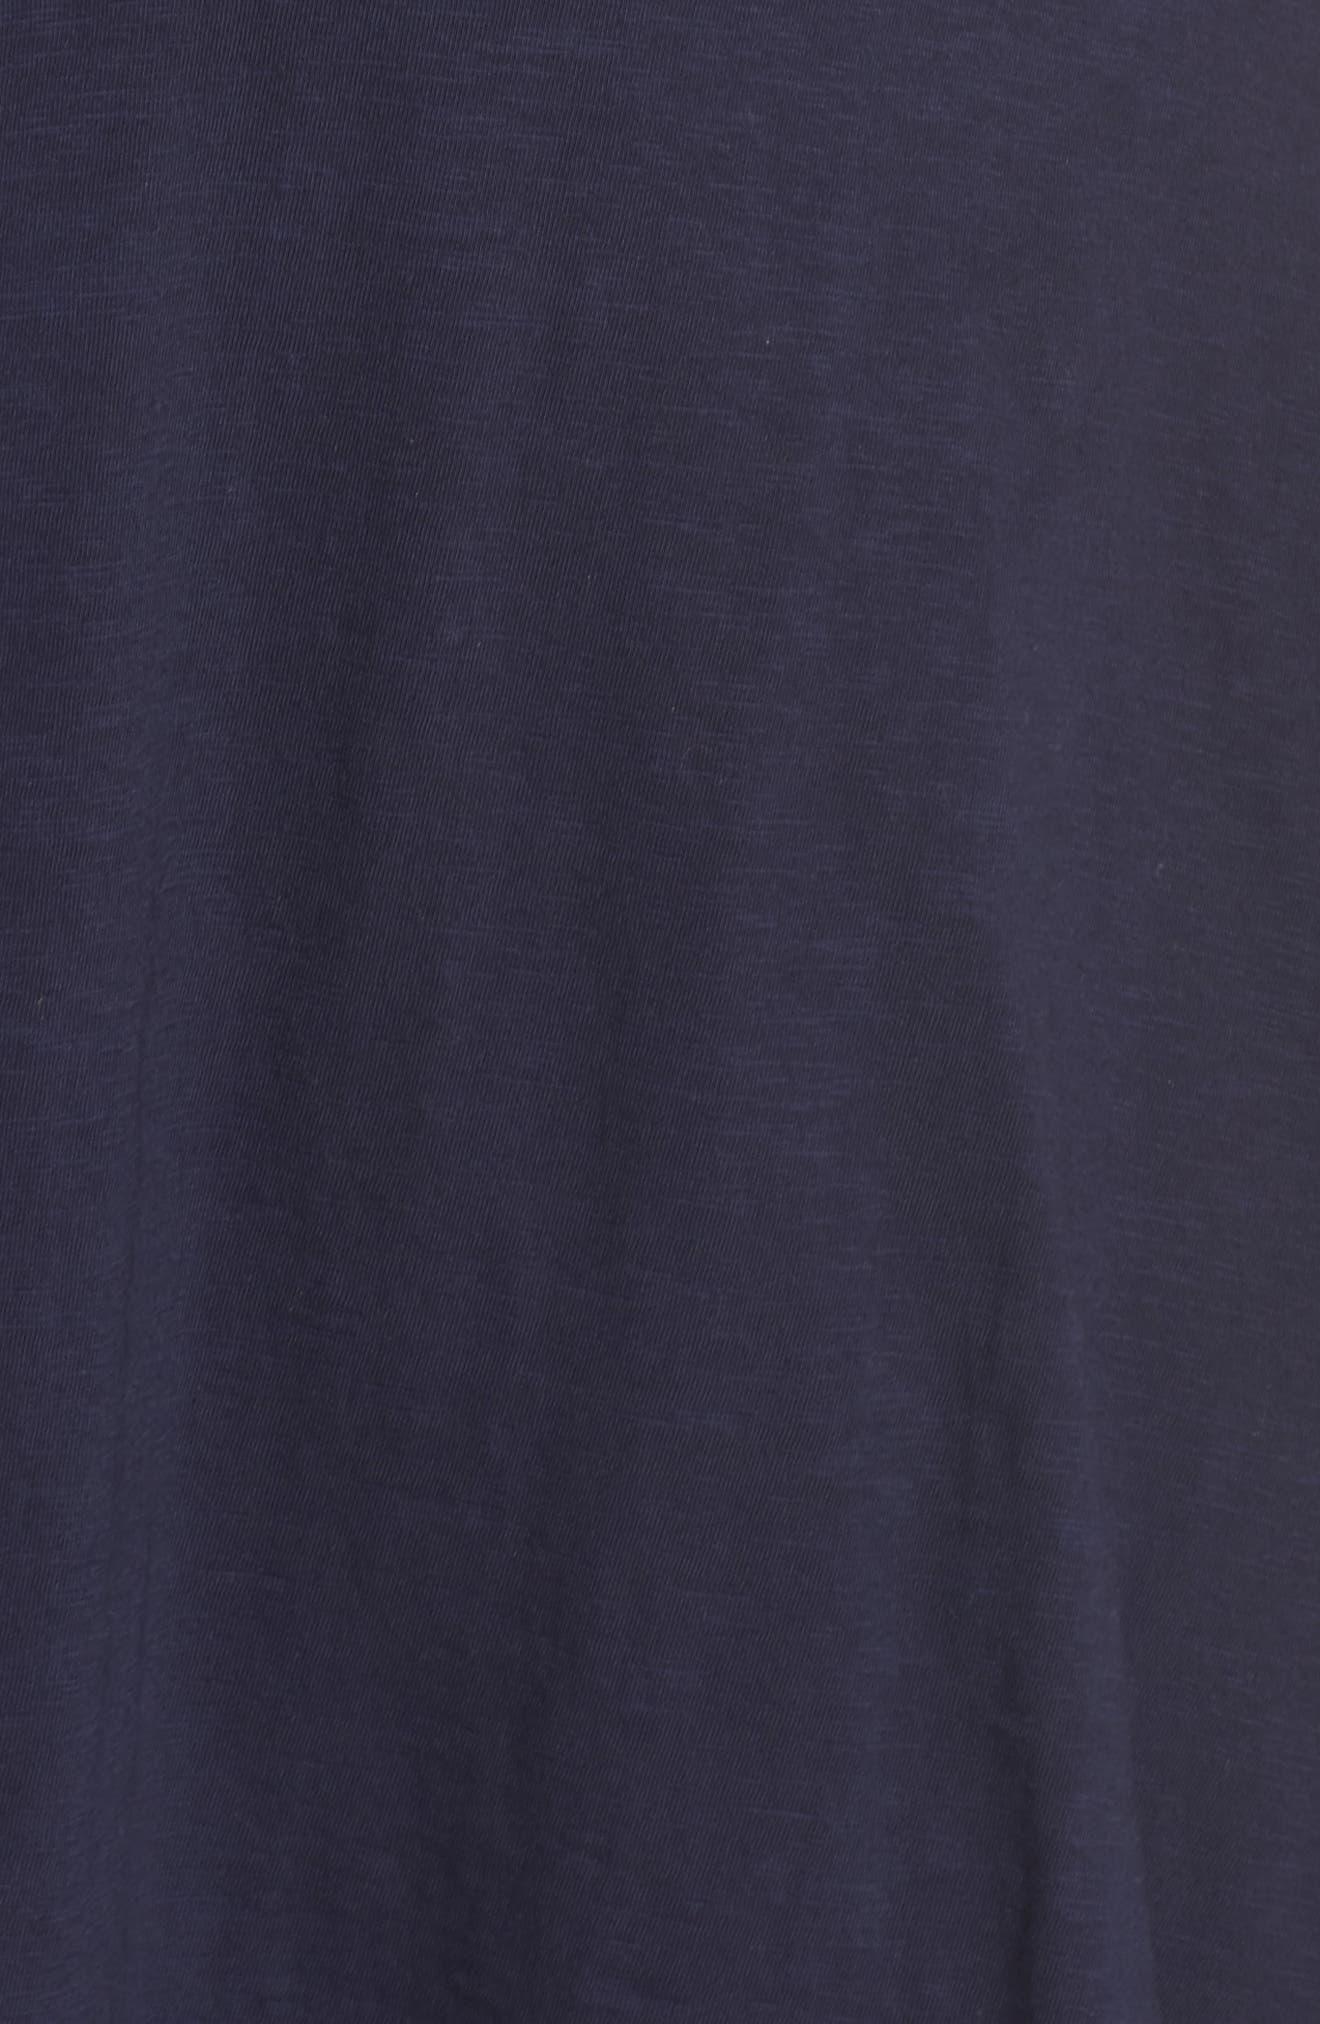 Twist Front Knit Dress,                             Alternate thumbnail 5, color,                             Navy Peacoat